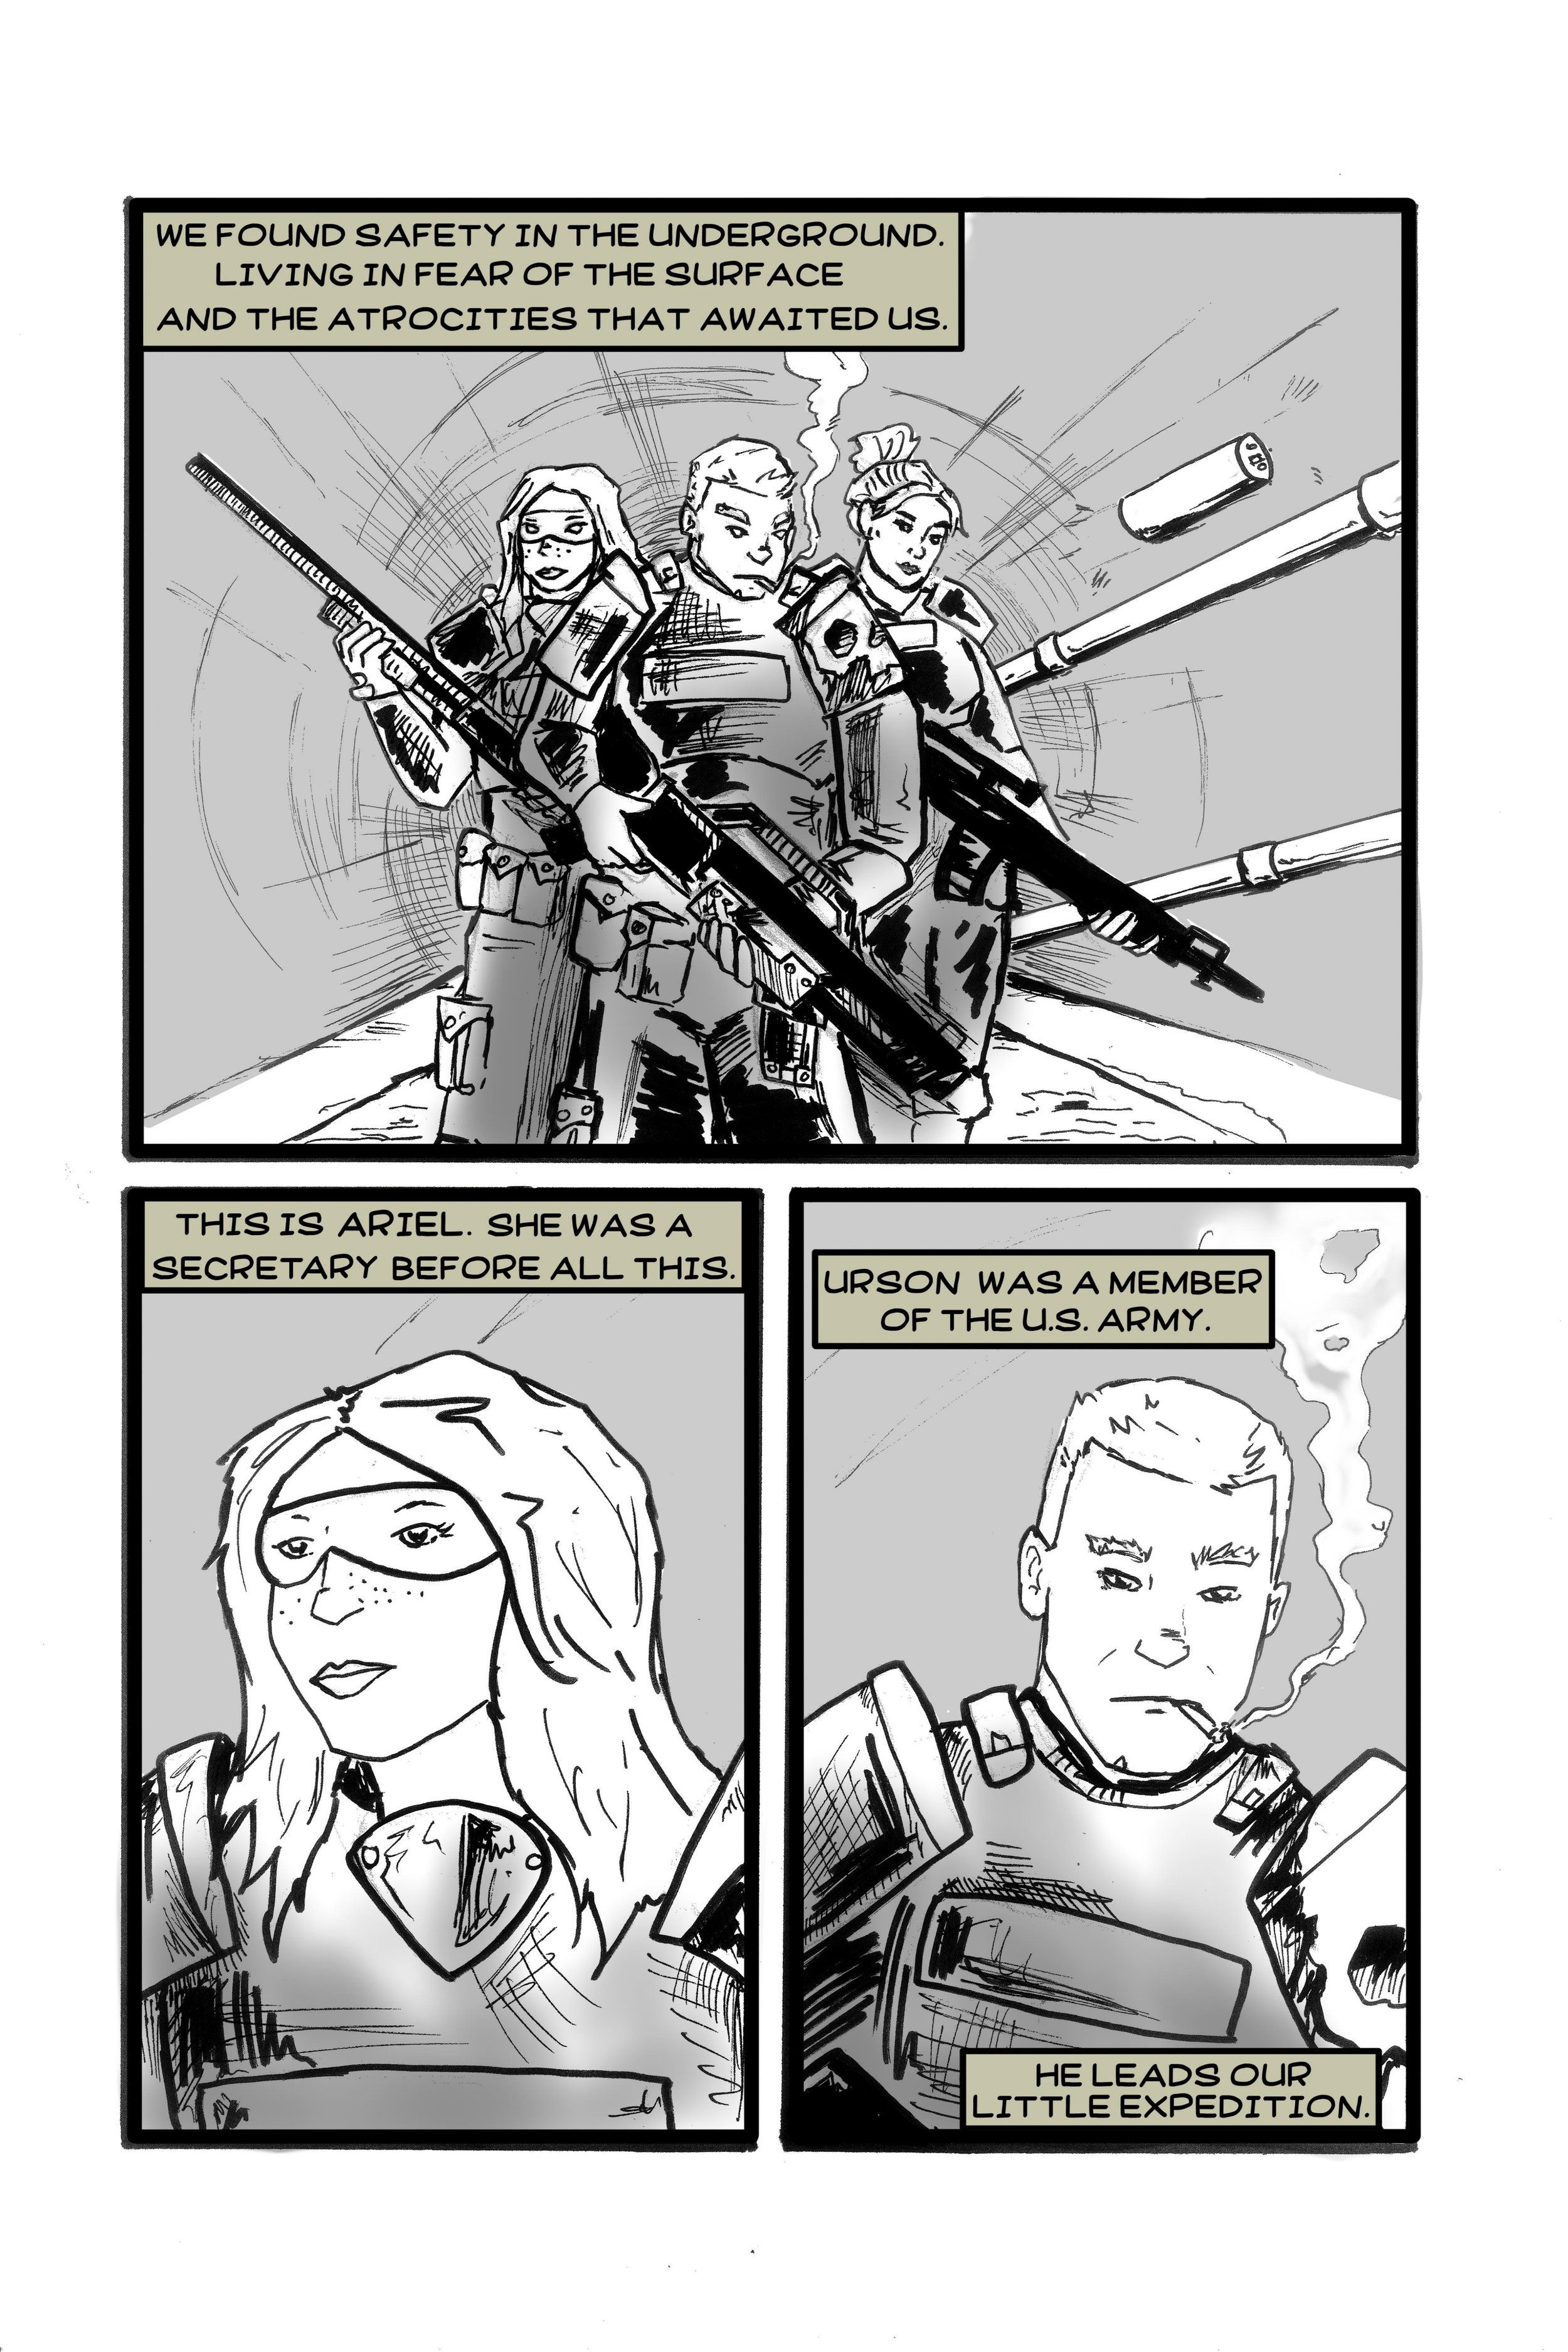 twh page5.jpg